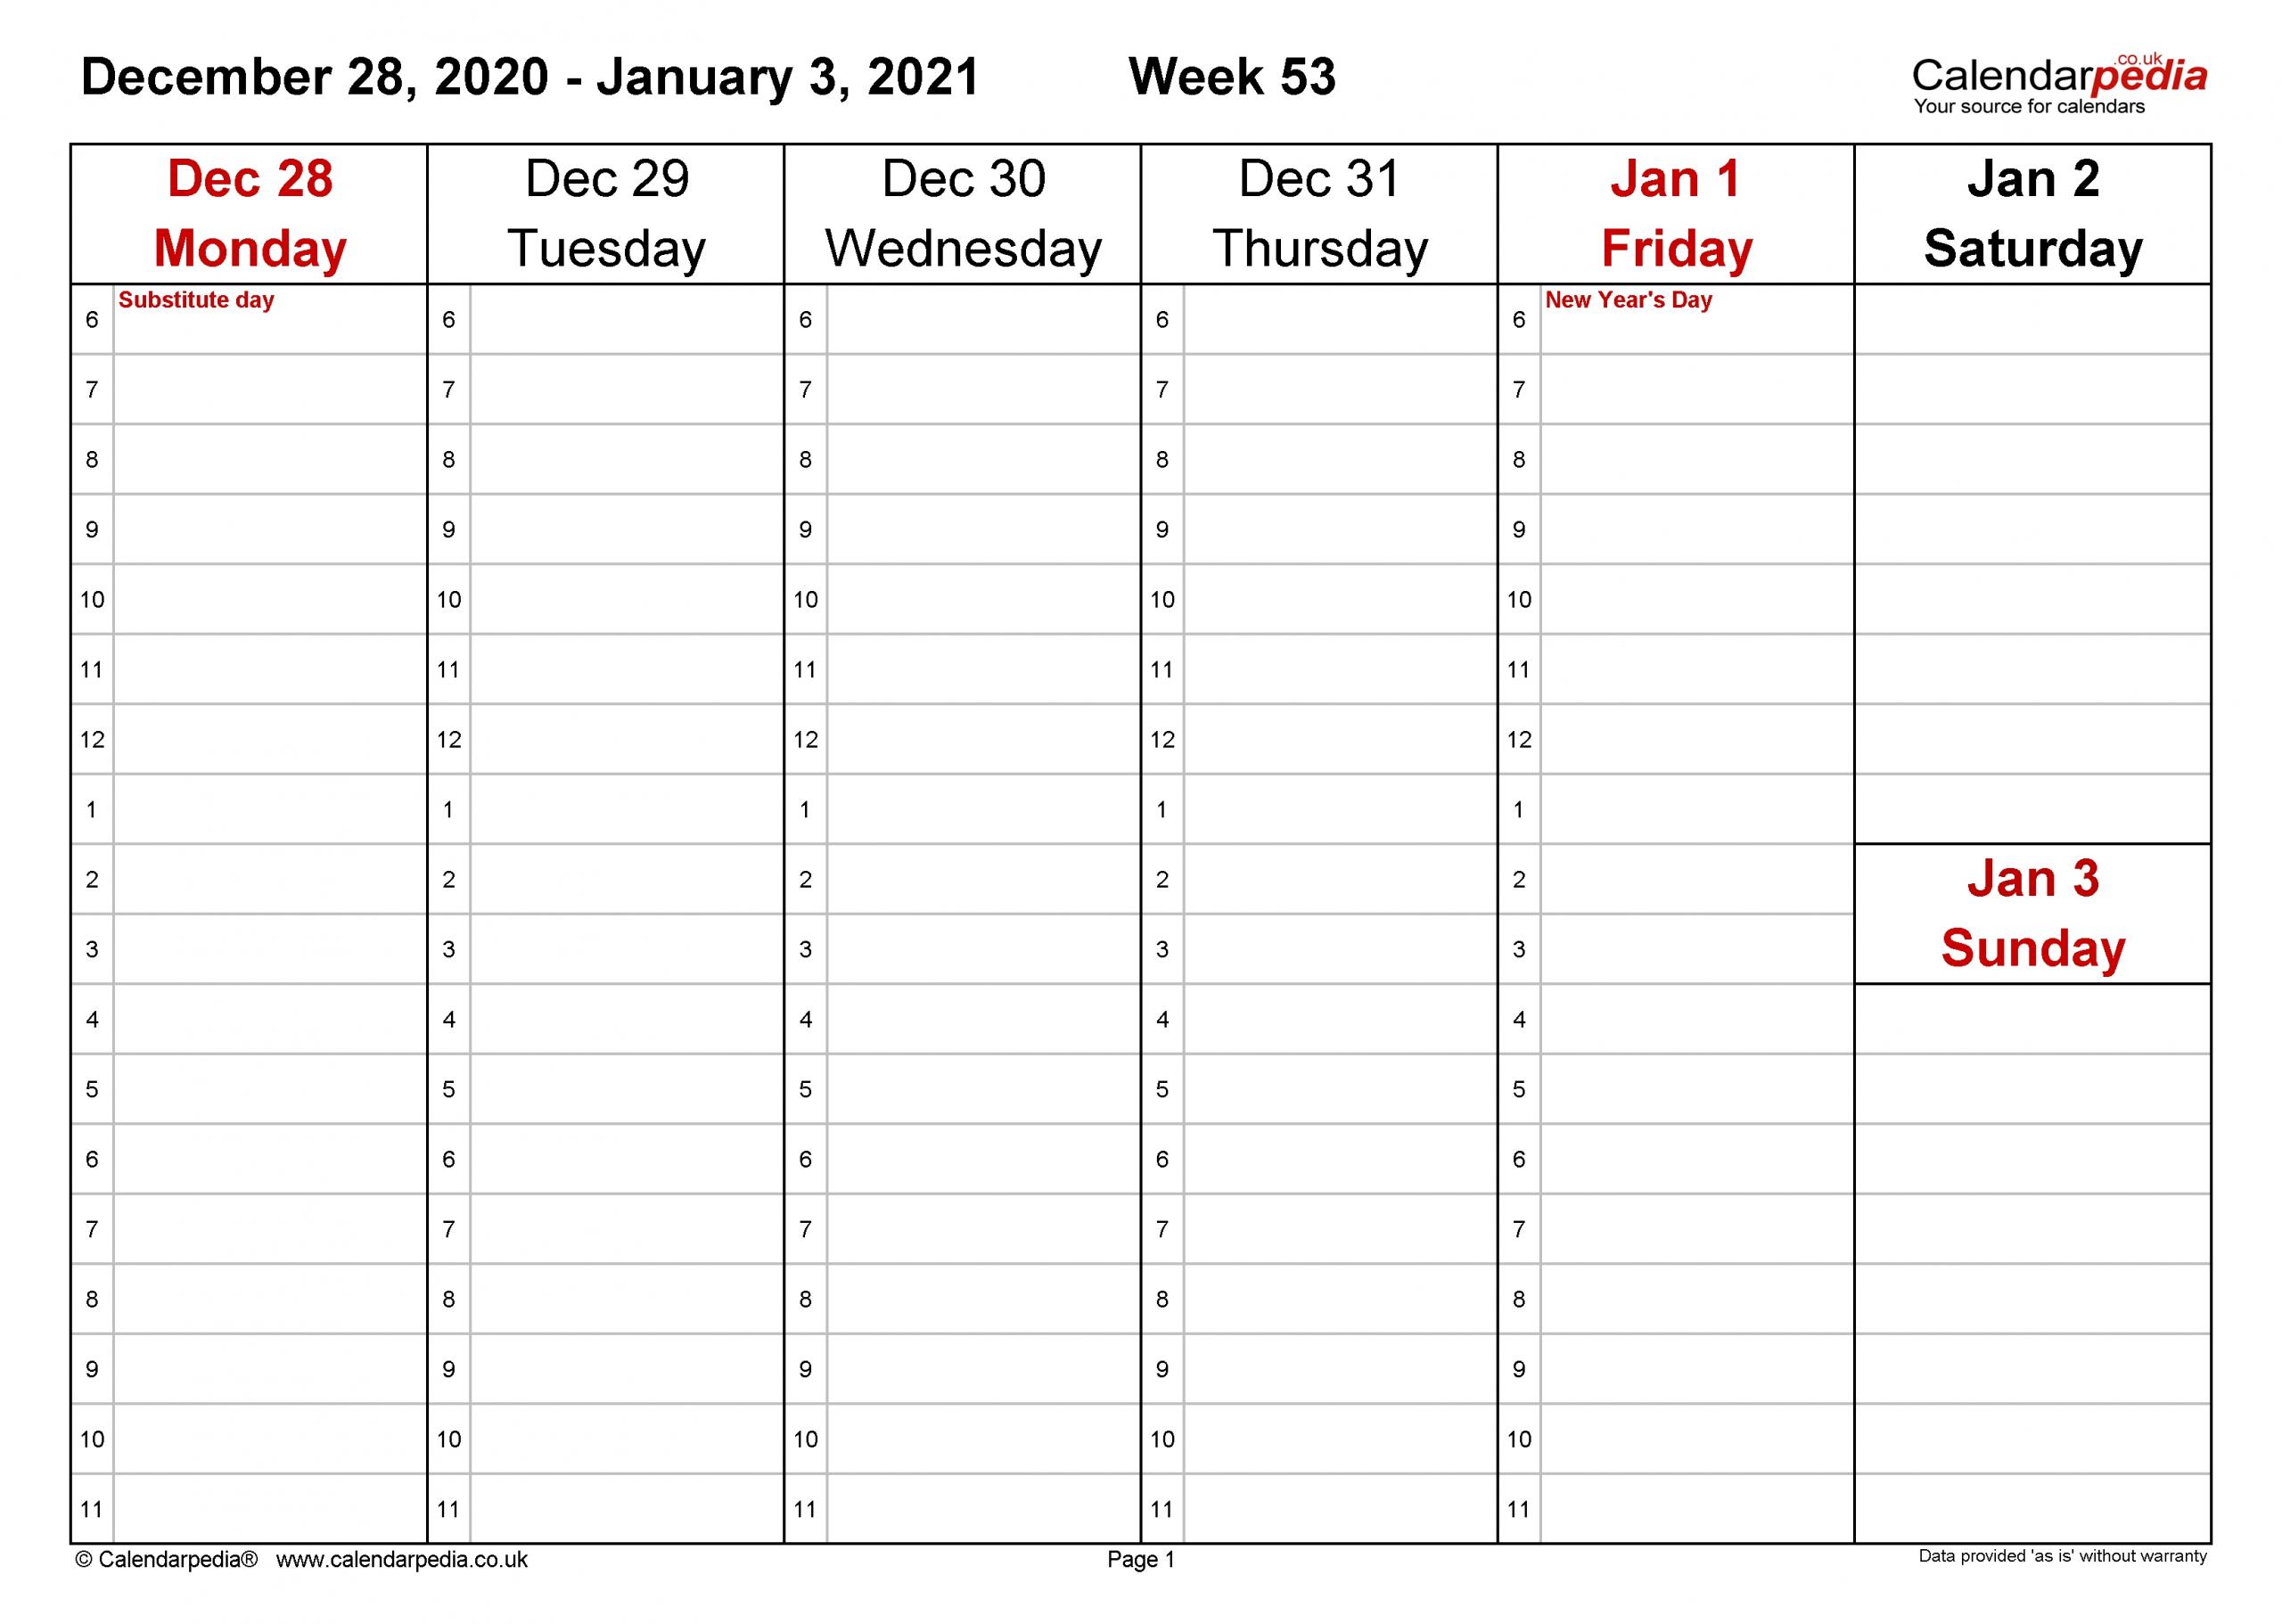 Weekly Calendar 2021 Uk - Free Printable Templates For Excel-2021 Calnder By Week No Excel